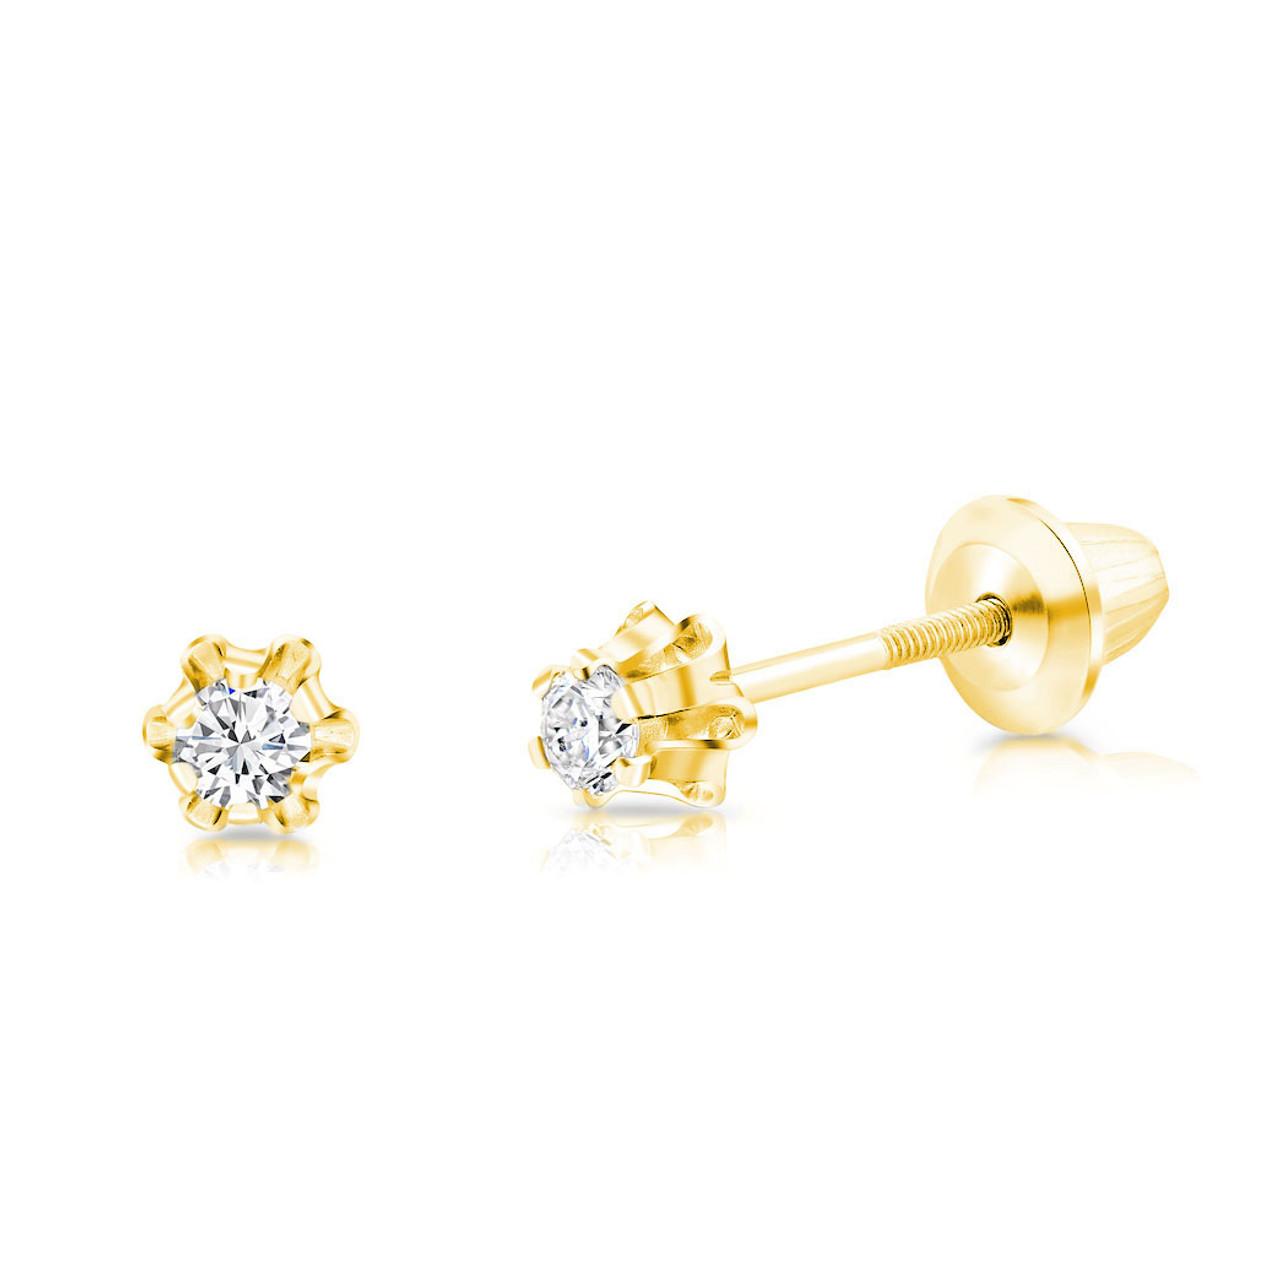 Children S Diamond Stud Earrings Screw Back 14tcw 14k Gold The Jeweled Lullaby